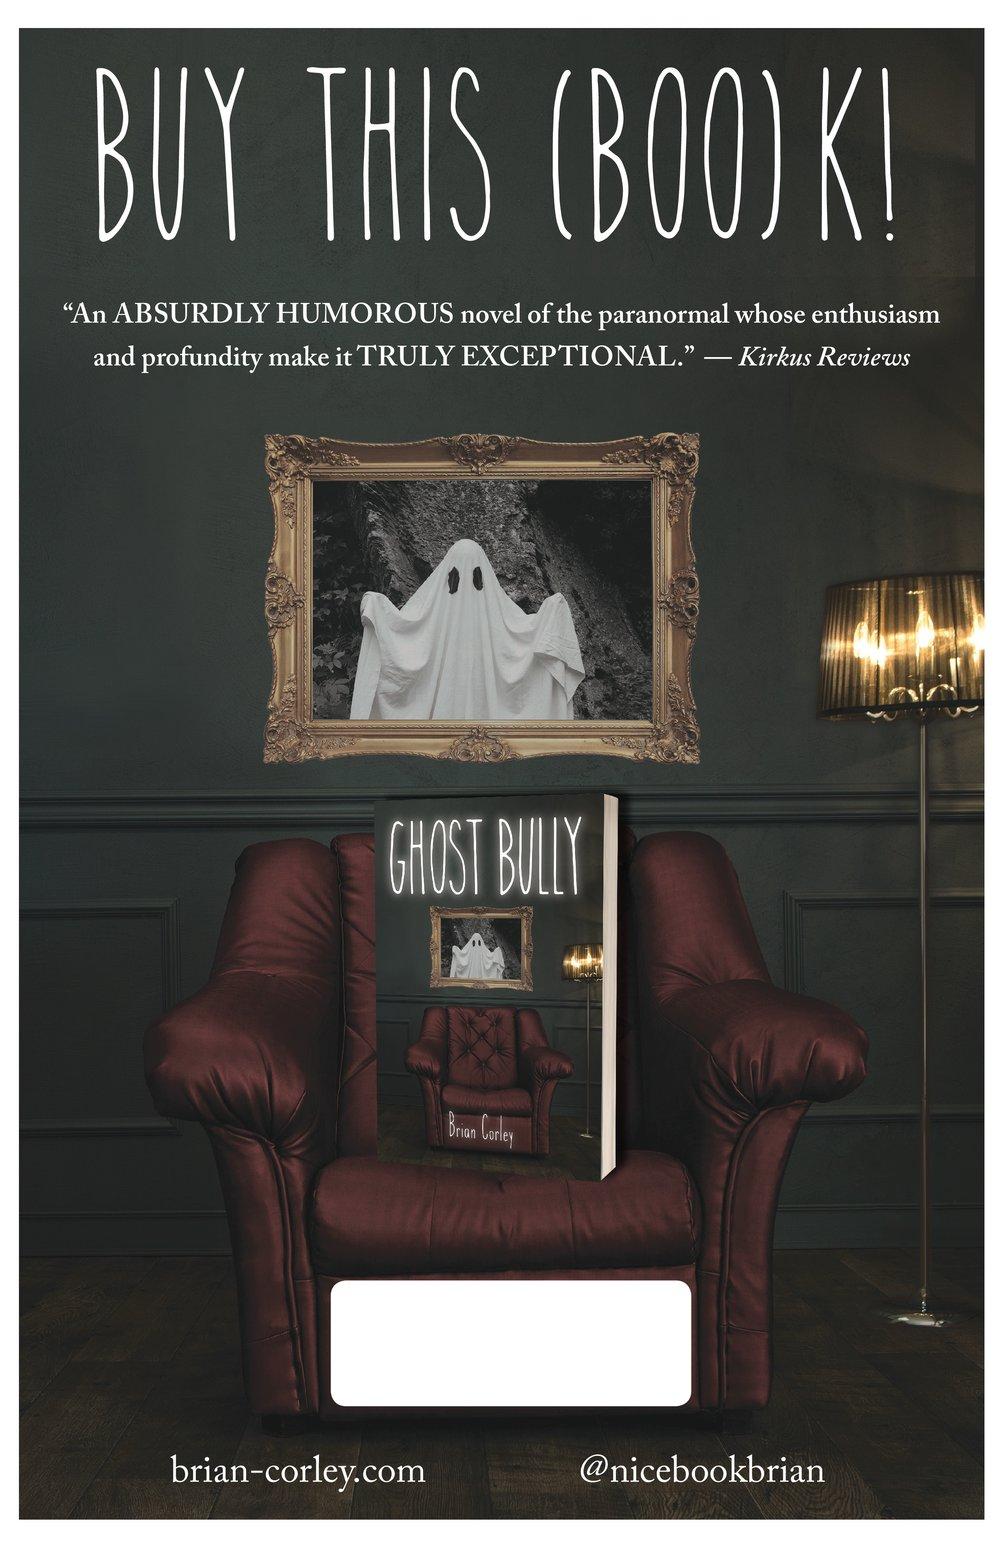 Ghost Bully Poster.jpg